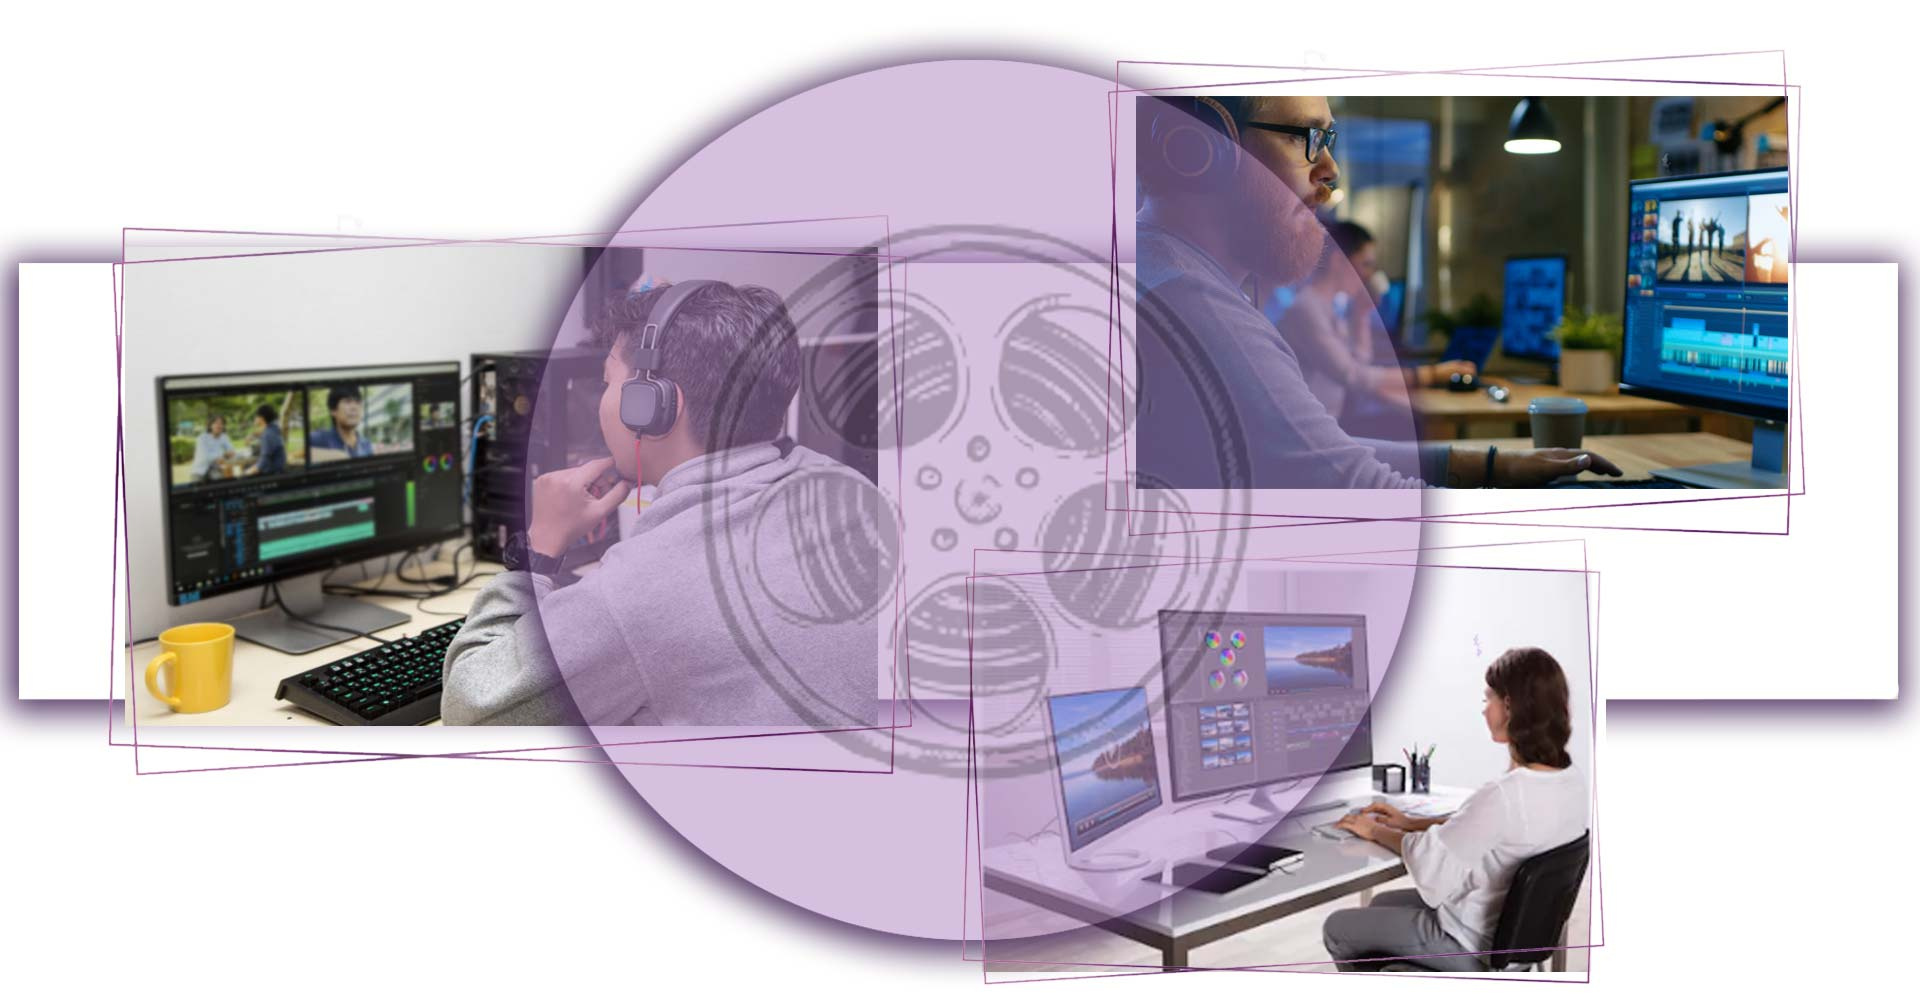 Editing 5 - کار تدوینگر چیست ؟ معرفی شغل تدوینگر